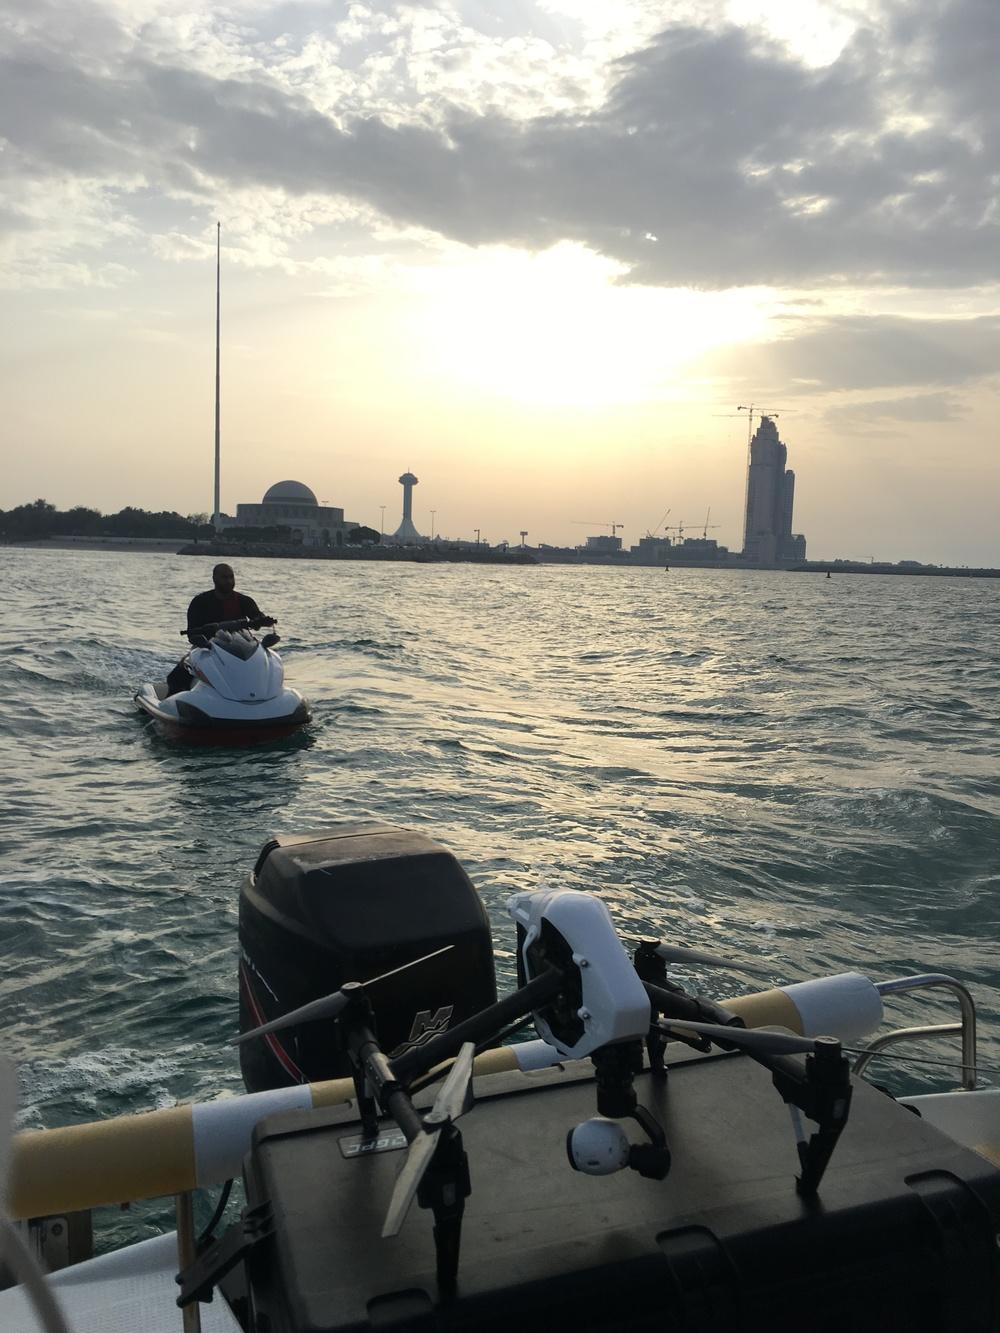 In Abu Dhabi